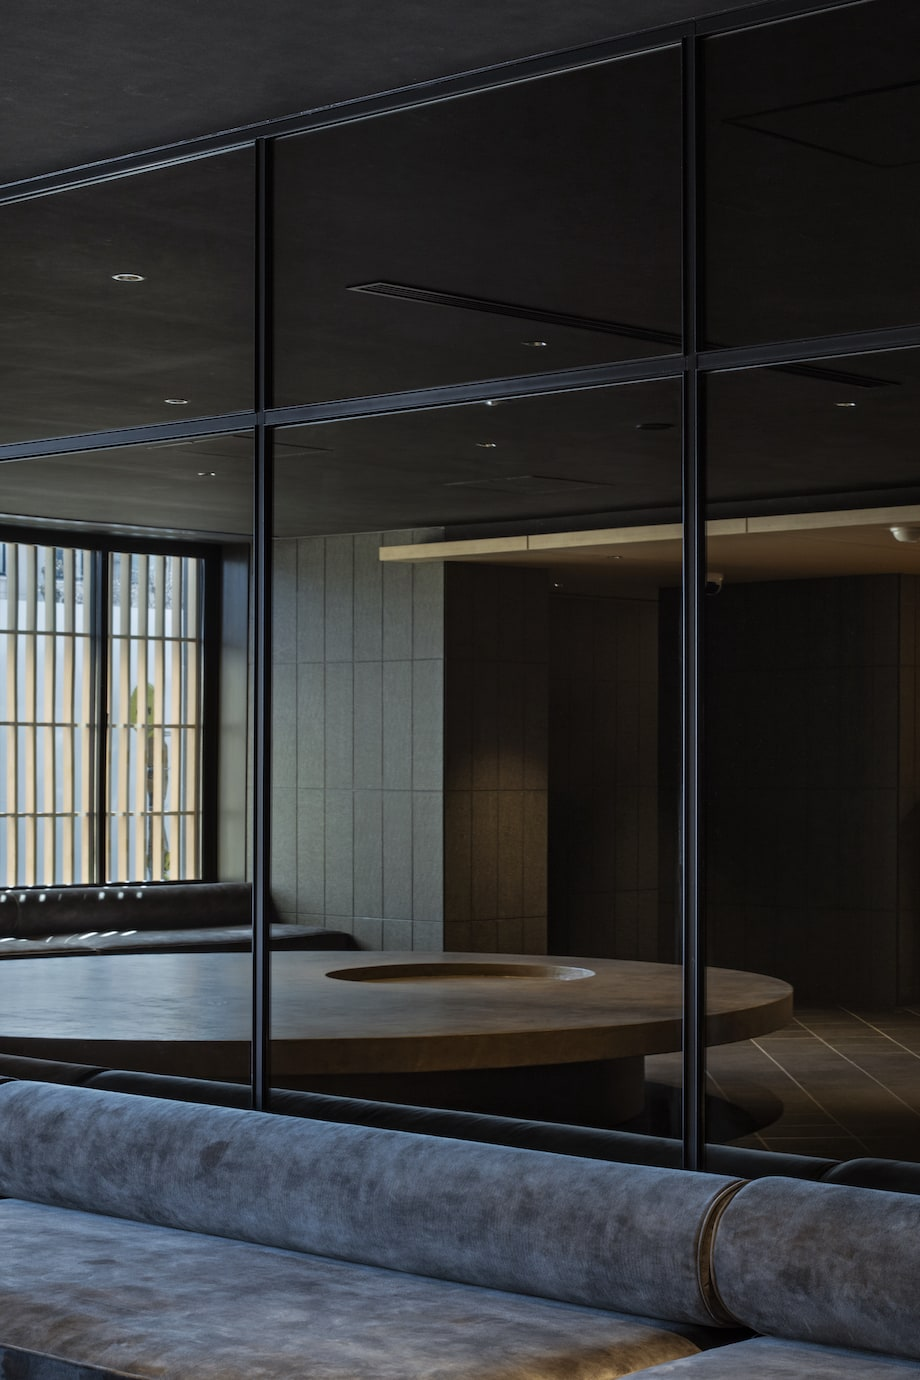 〈hotel tou nishinotoin kyoto by withceed(ホテル トウ 西洞院 京都 バイ ウィズシード)〉ロビー